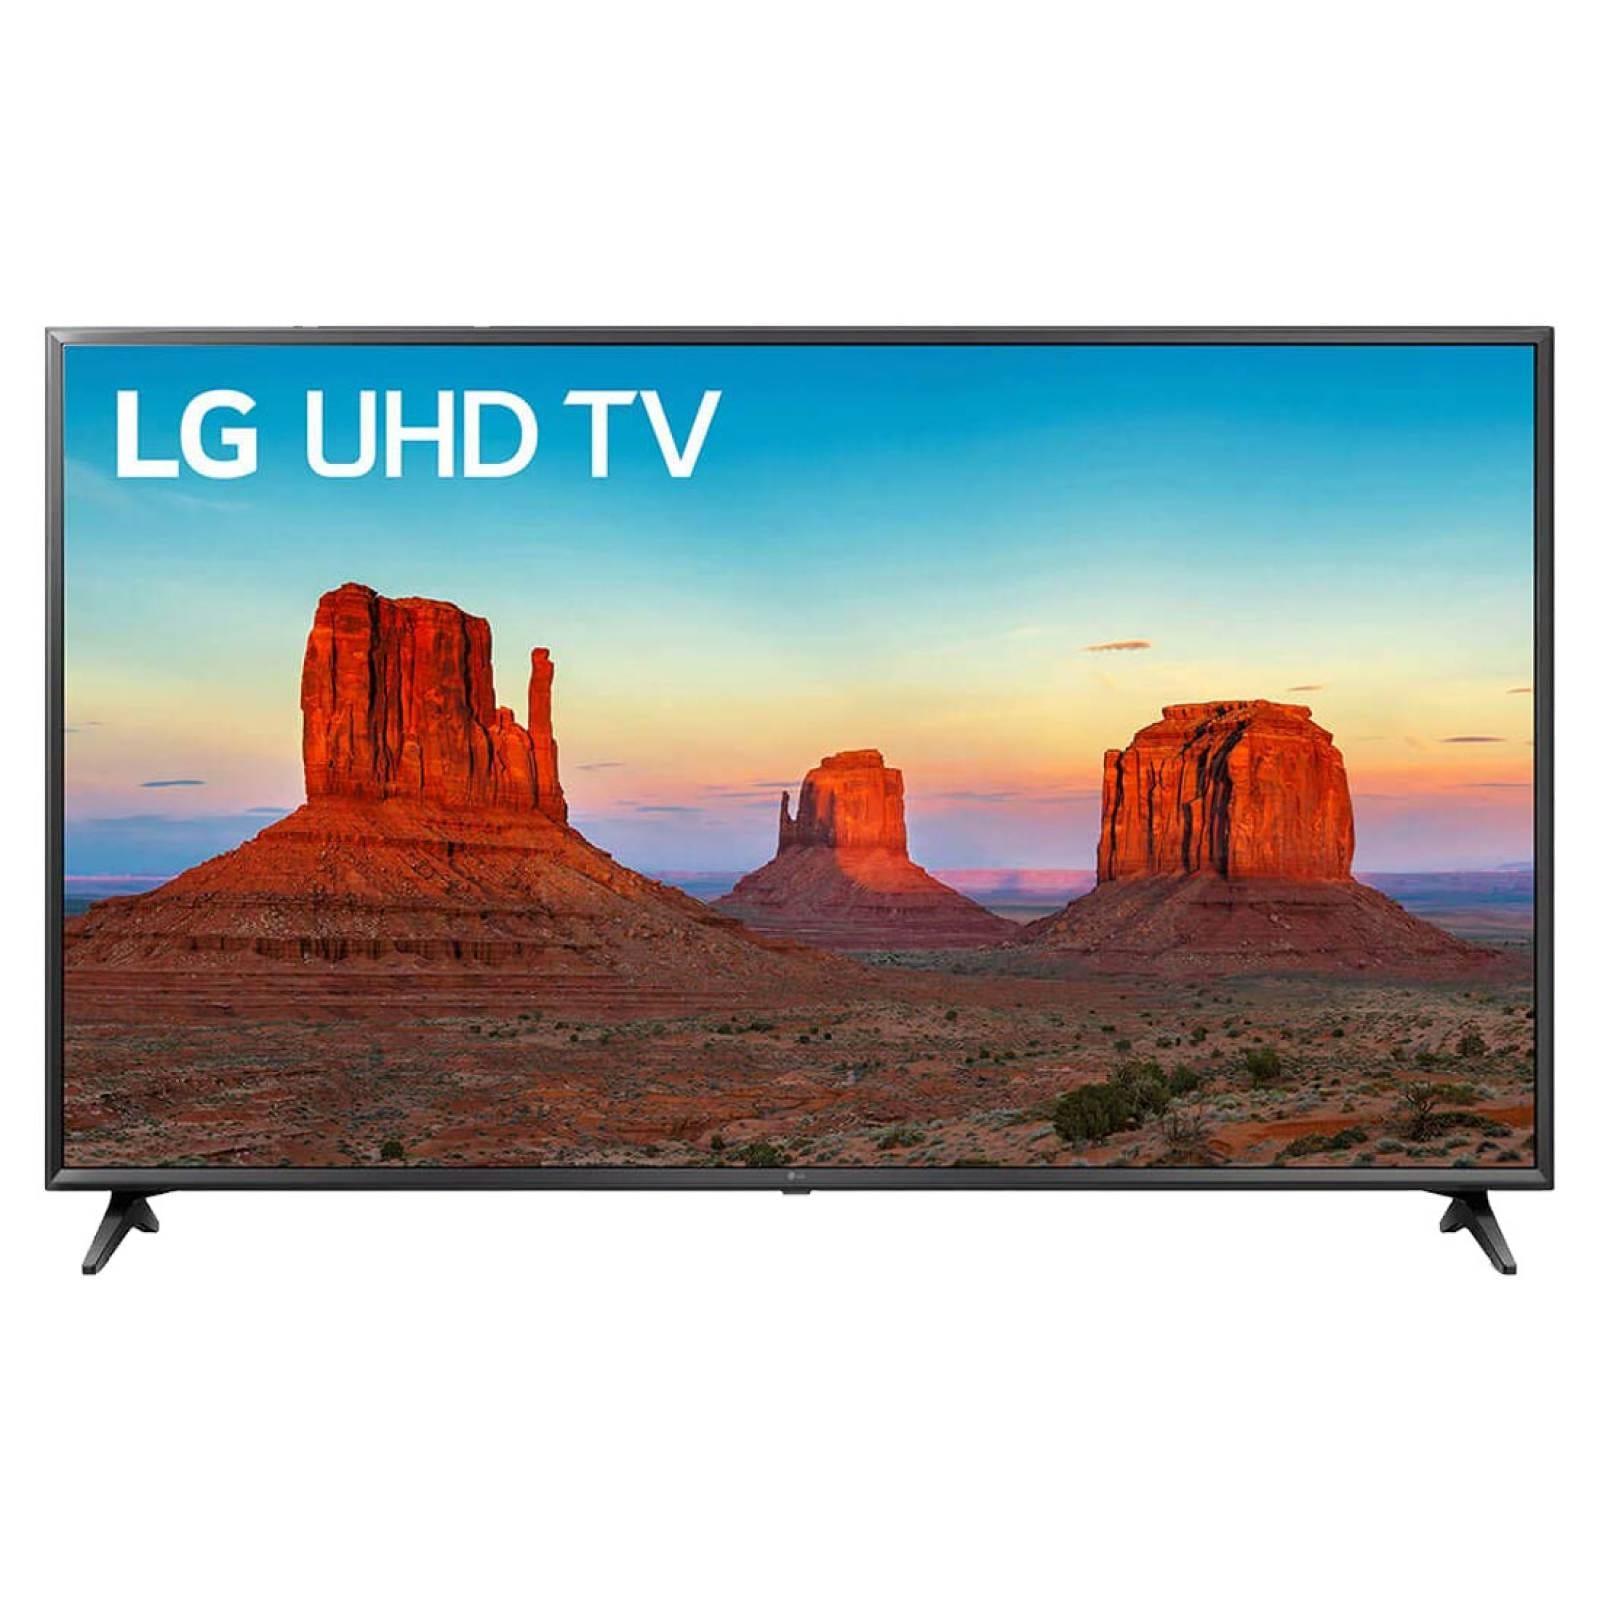 Pantalla Smart Tv LED 49 Pulg 4K Ultra HD 49UK6090PUA LG Reacondicionado